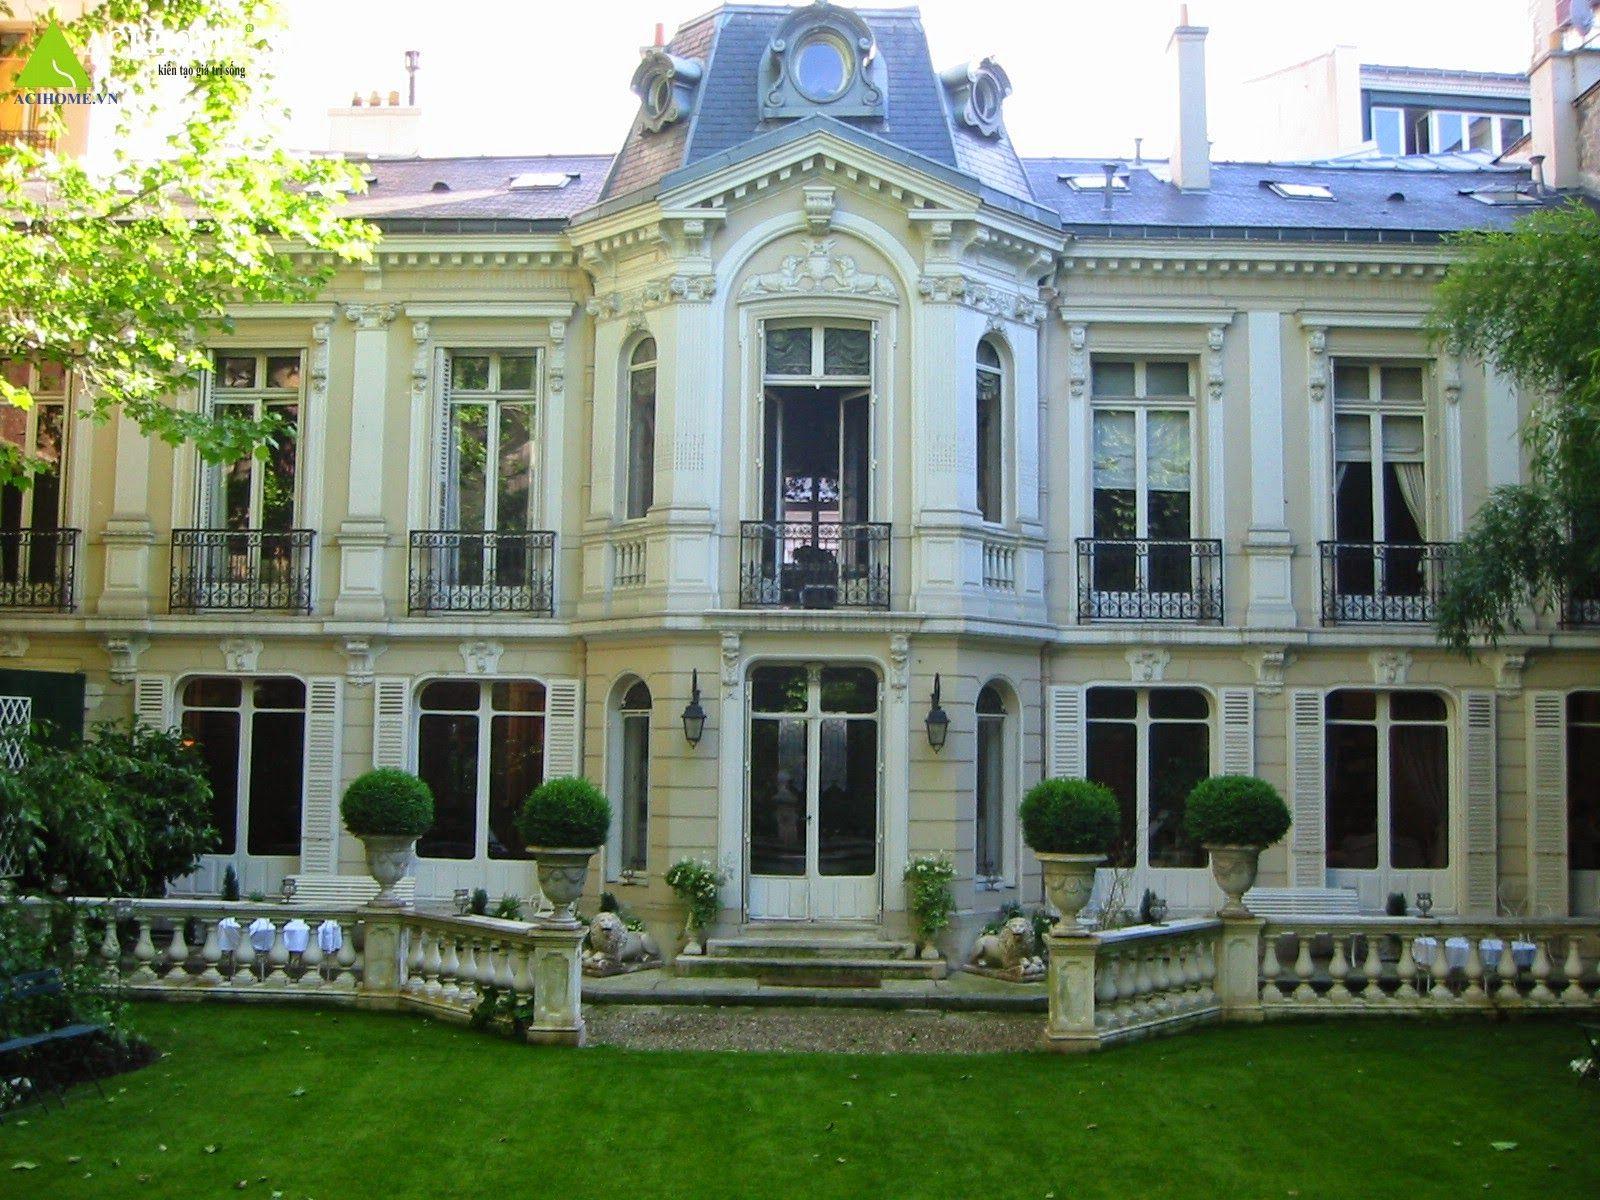 Kiến trúc Pháp tân cổ điển